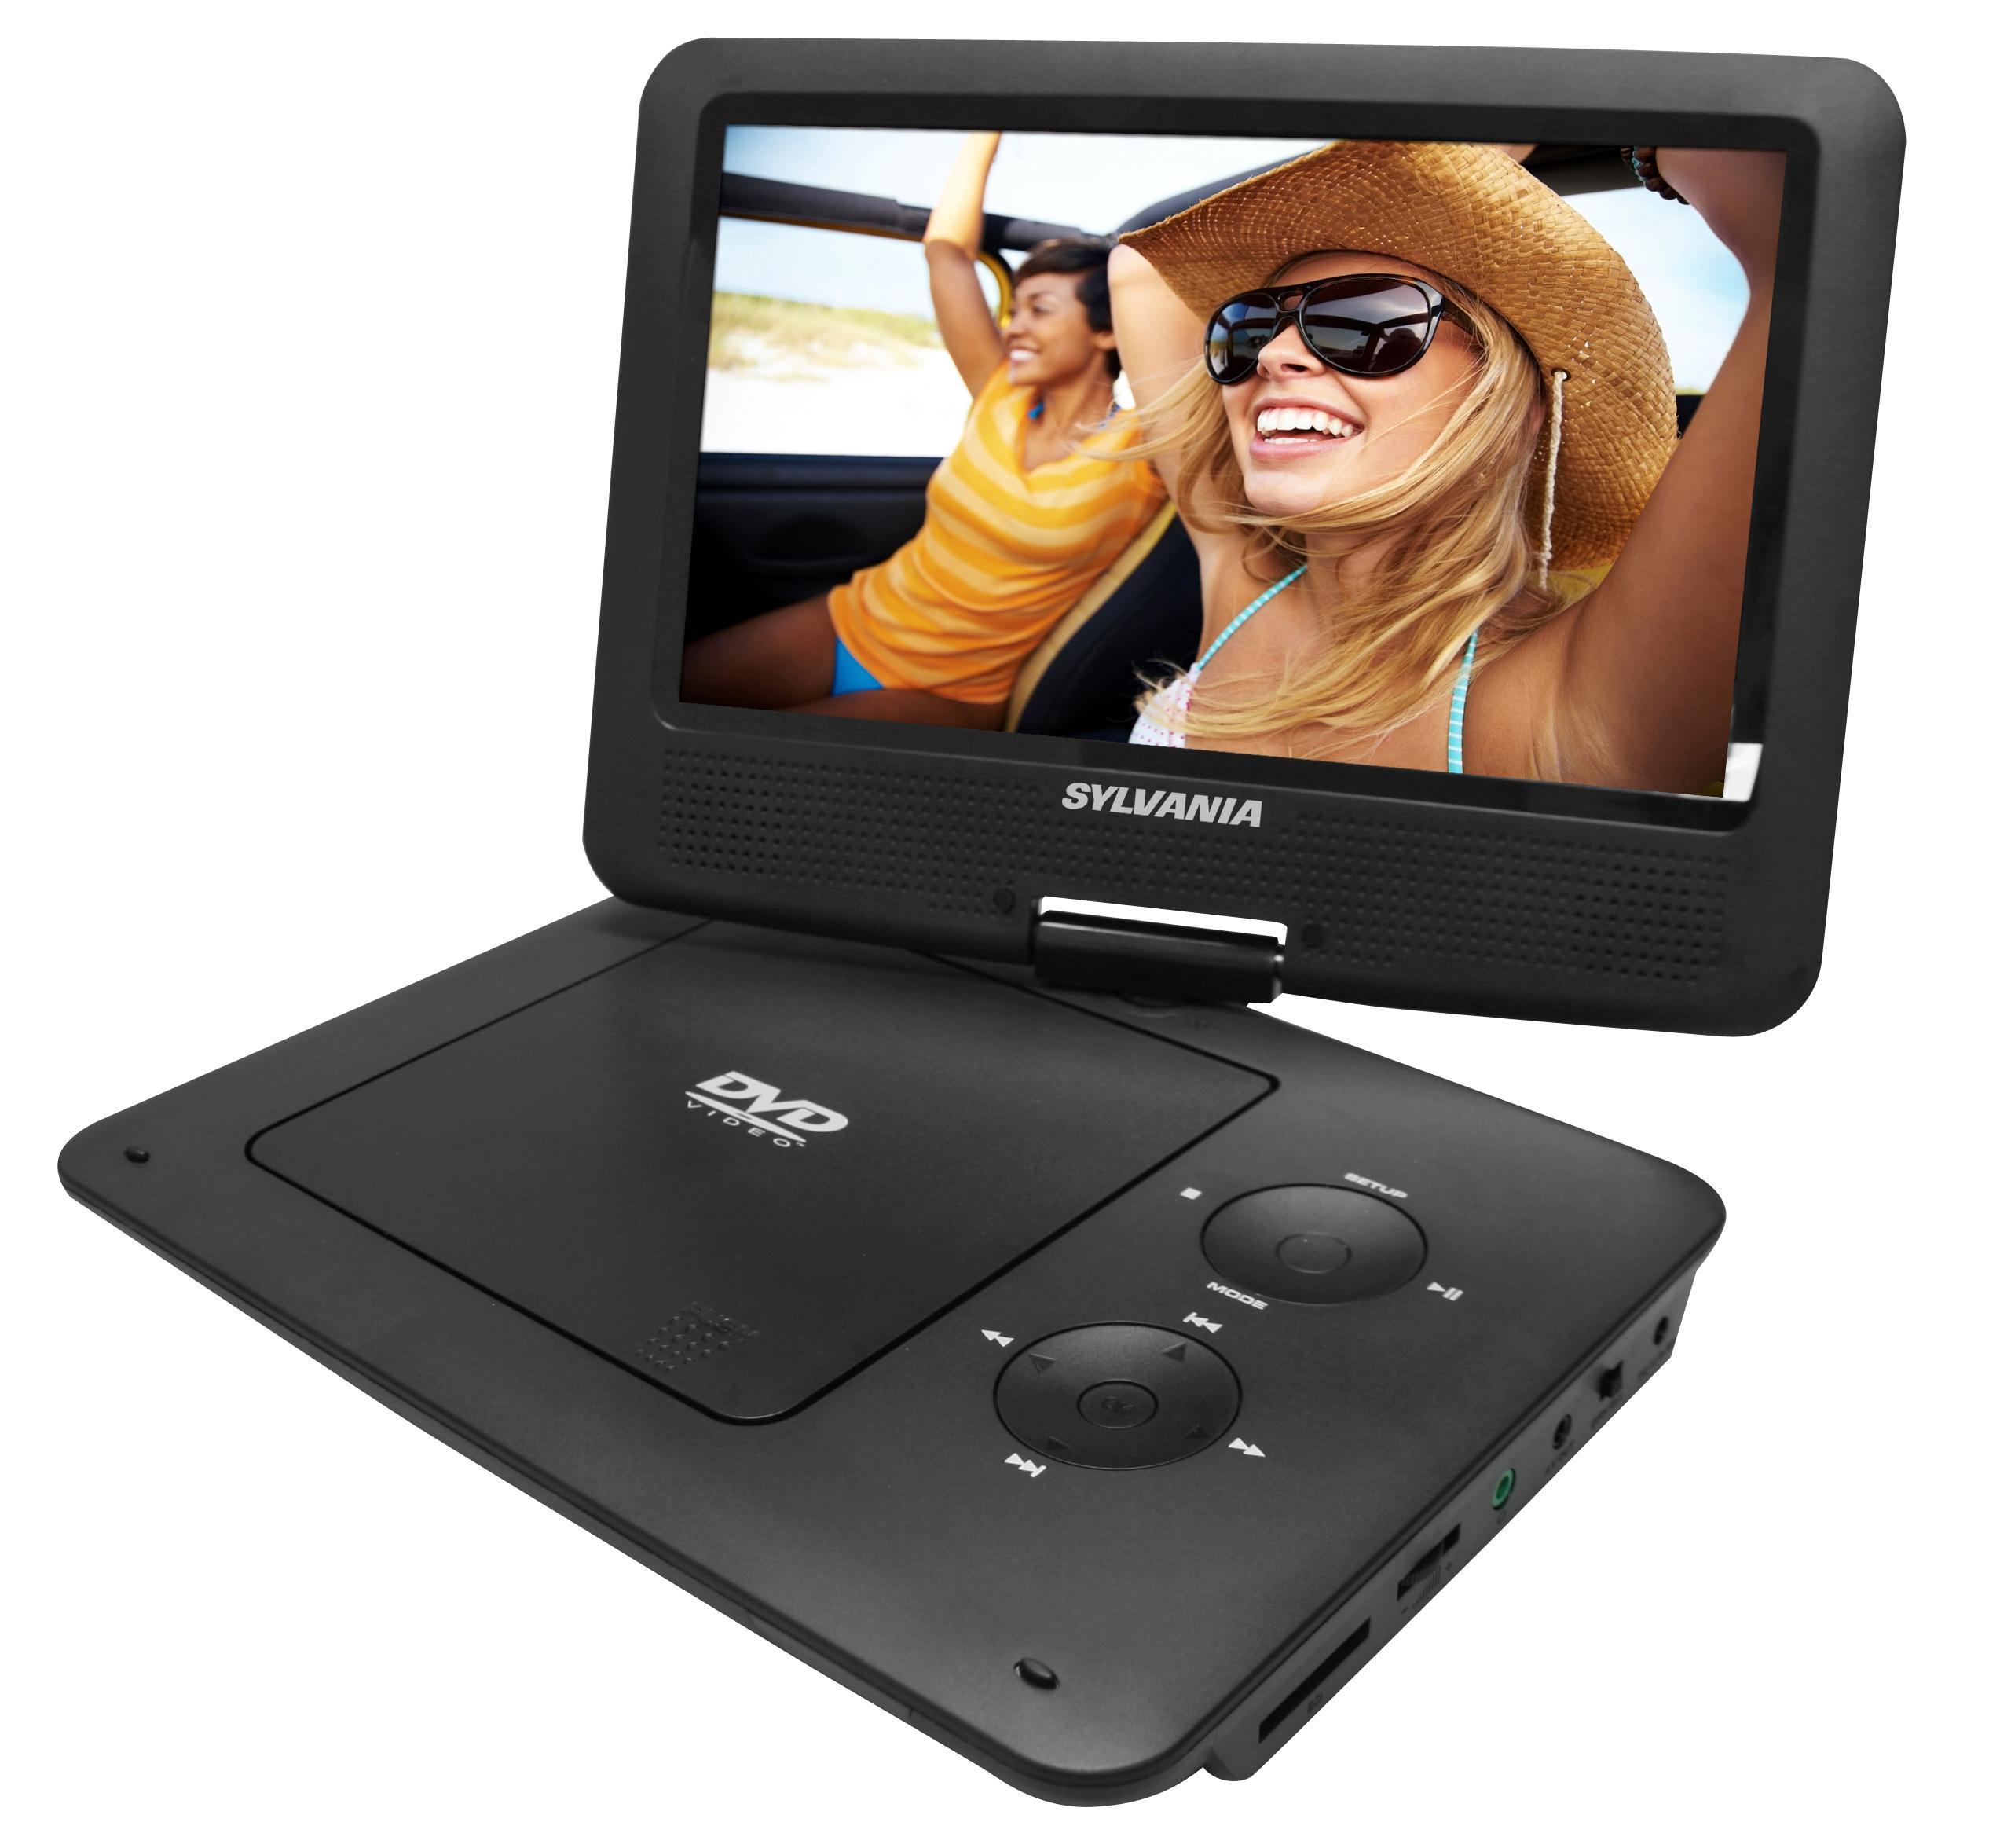 dvd player dvd portable dvd for car dvd player for travel kids